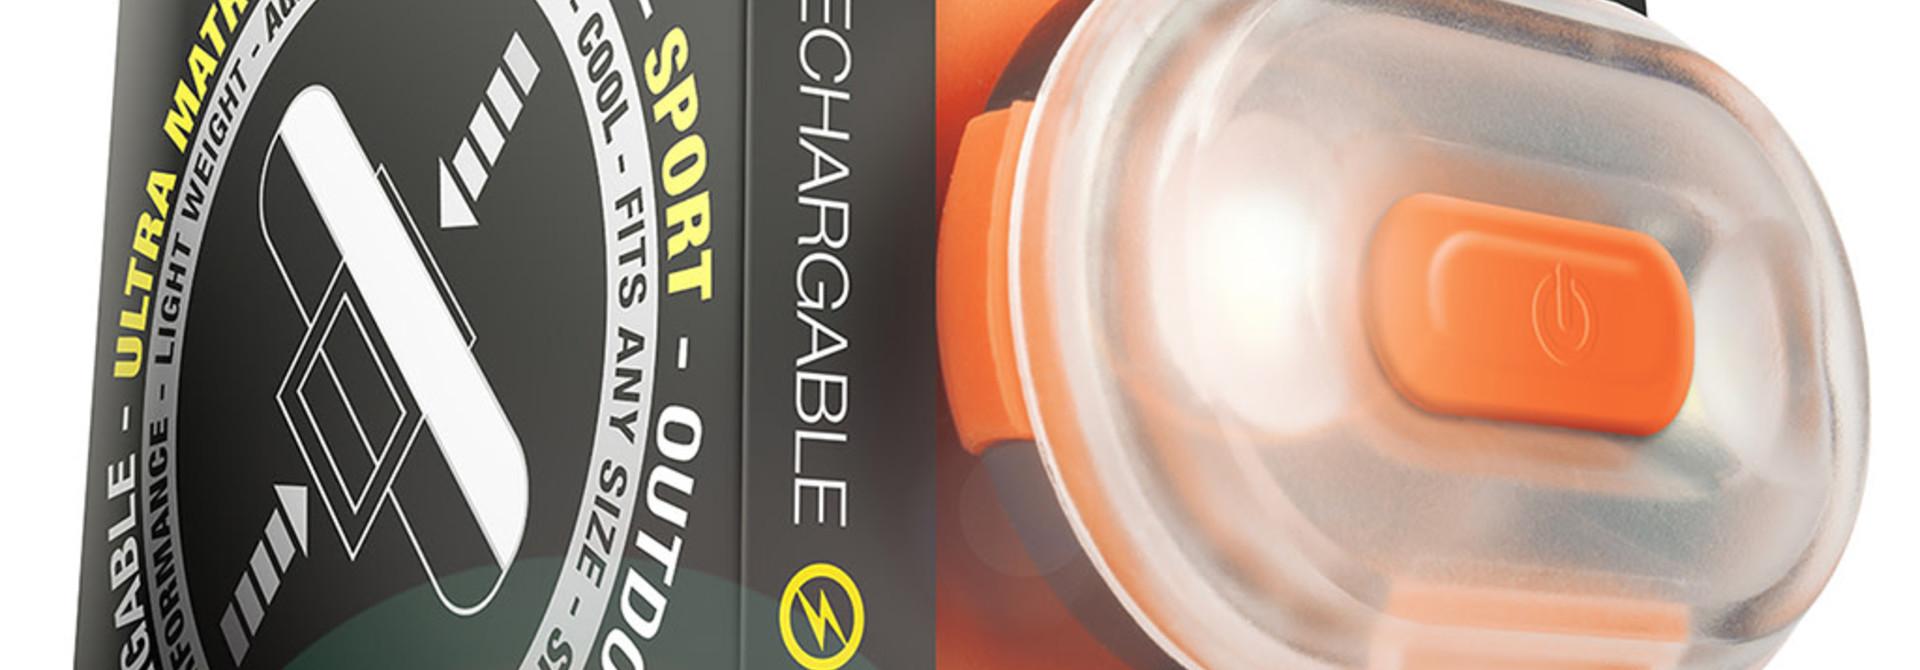 Matrix Ultra LED Safety Light Orange Cube Pack